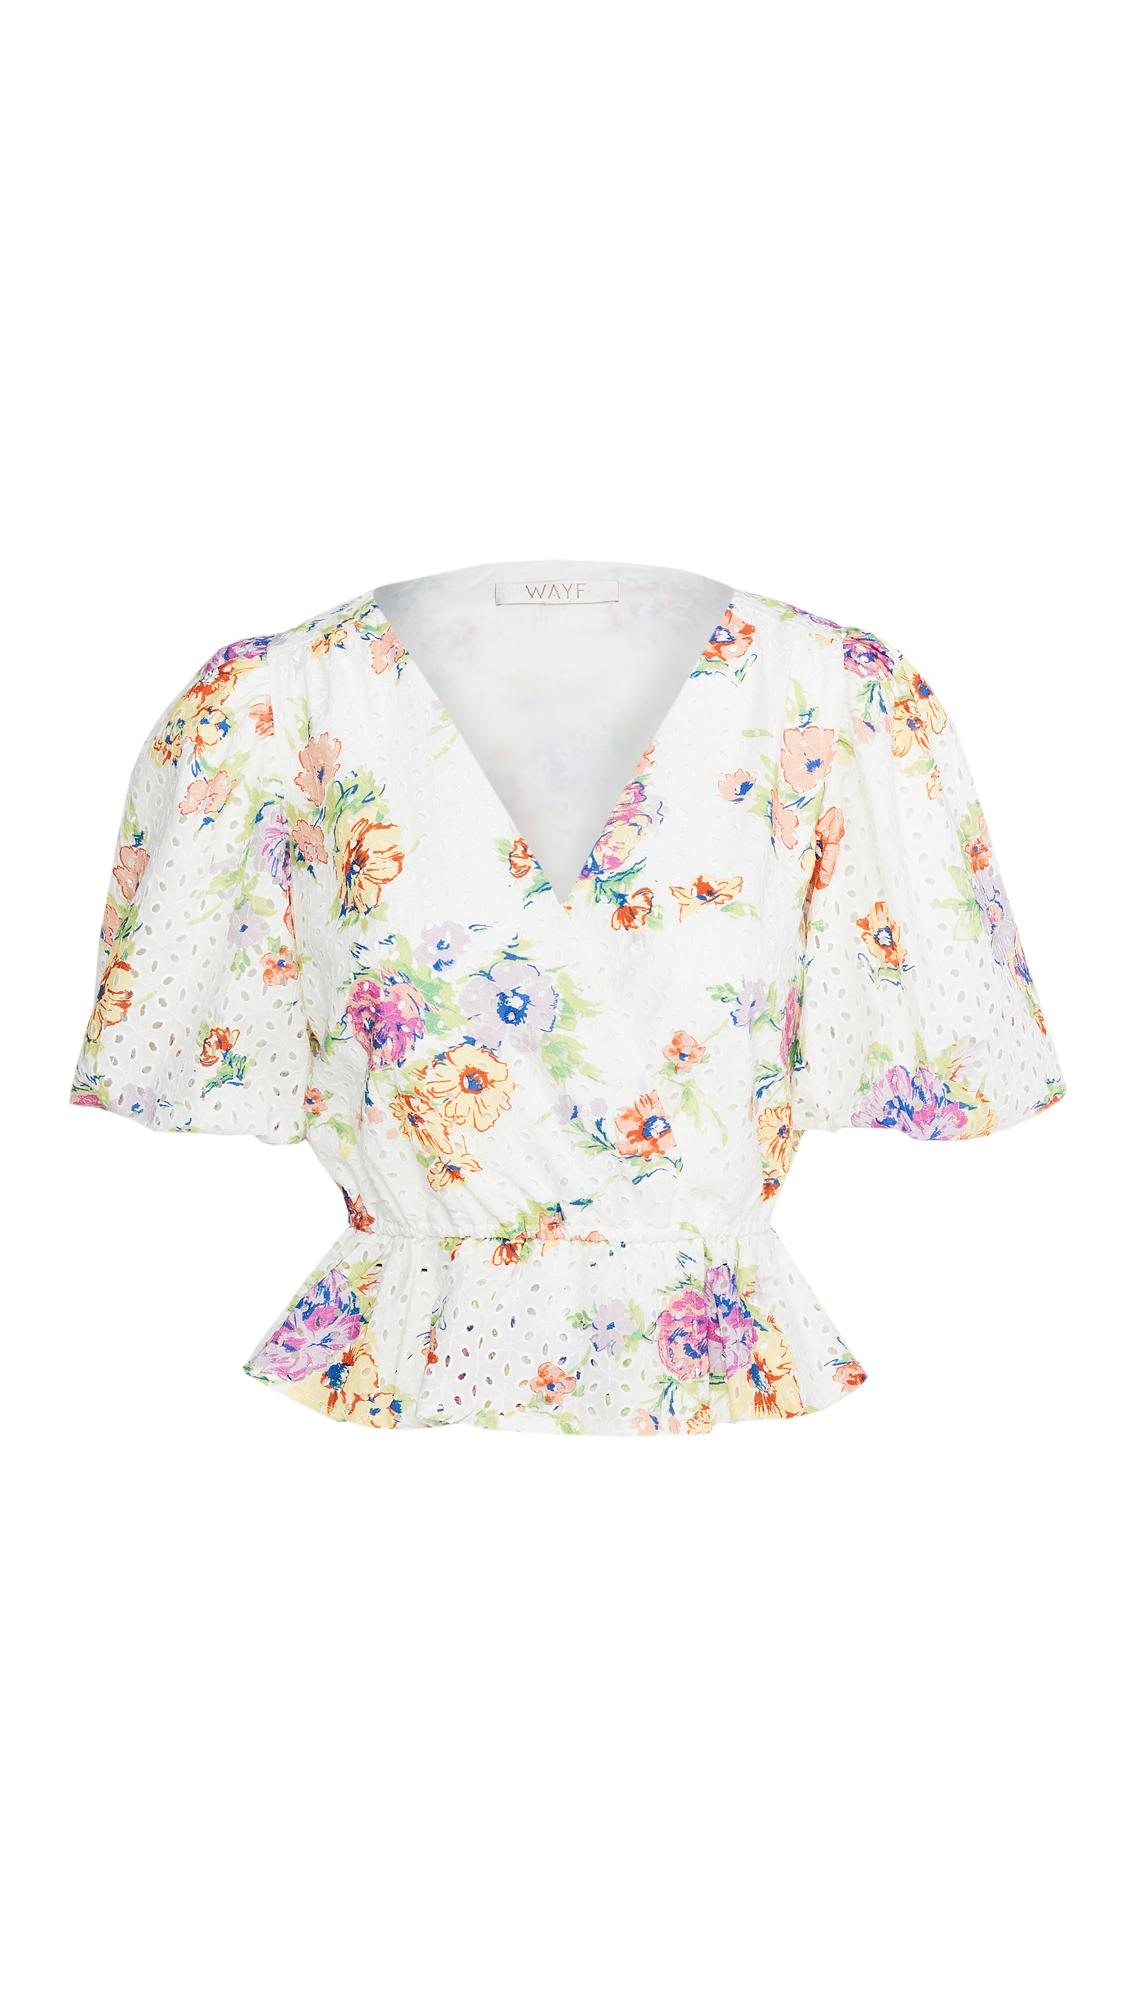 WAYF Pastel Floral Puff Sleeve Top